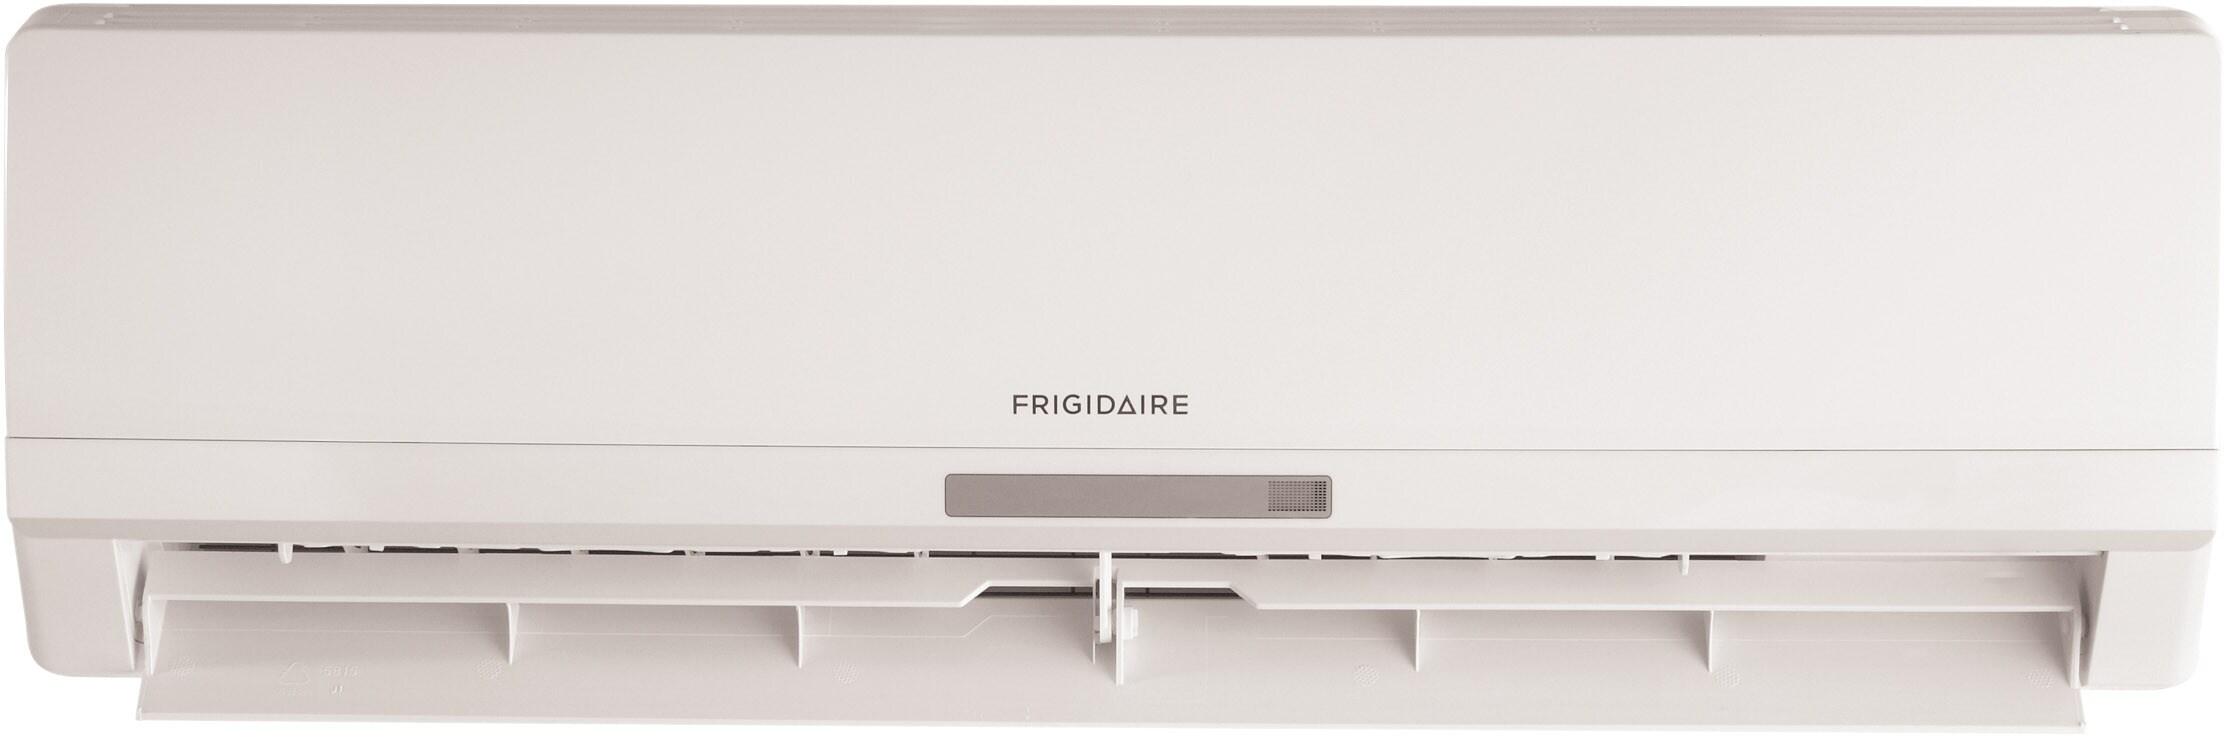 Ductless Split Air Conditioner with Heat Pump, 28,000 BTU